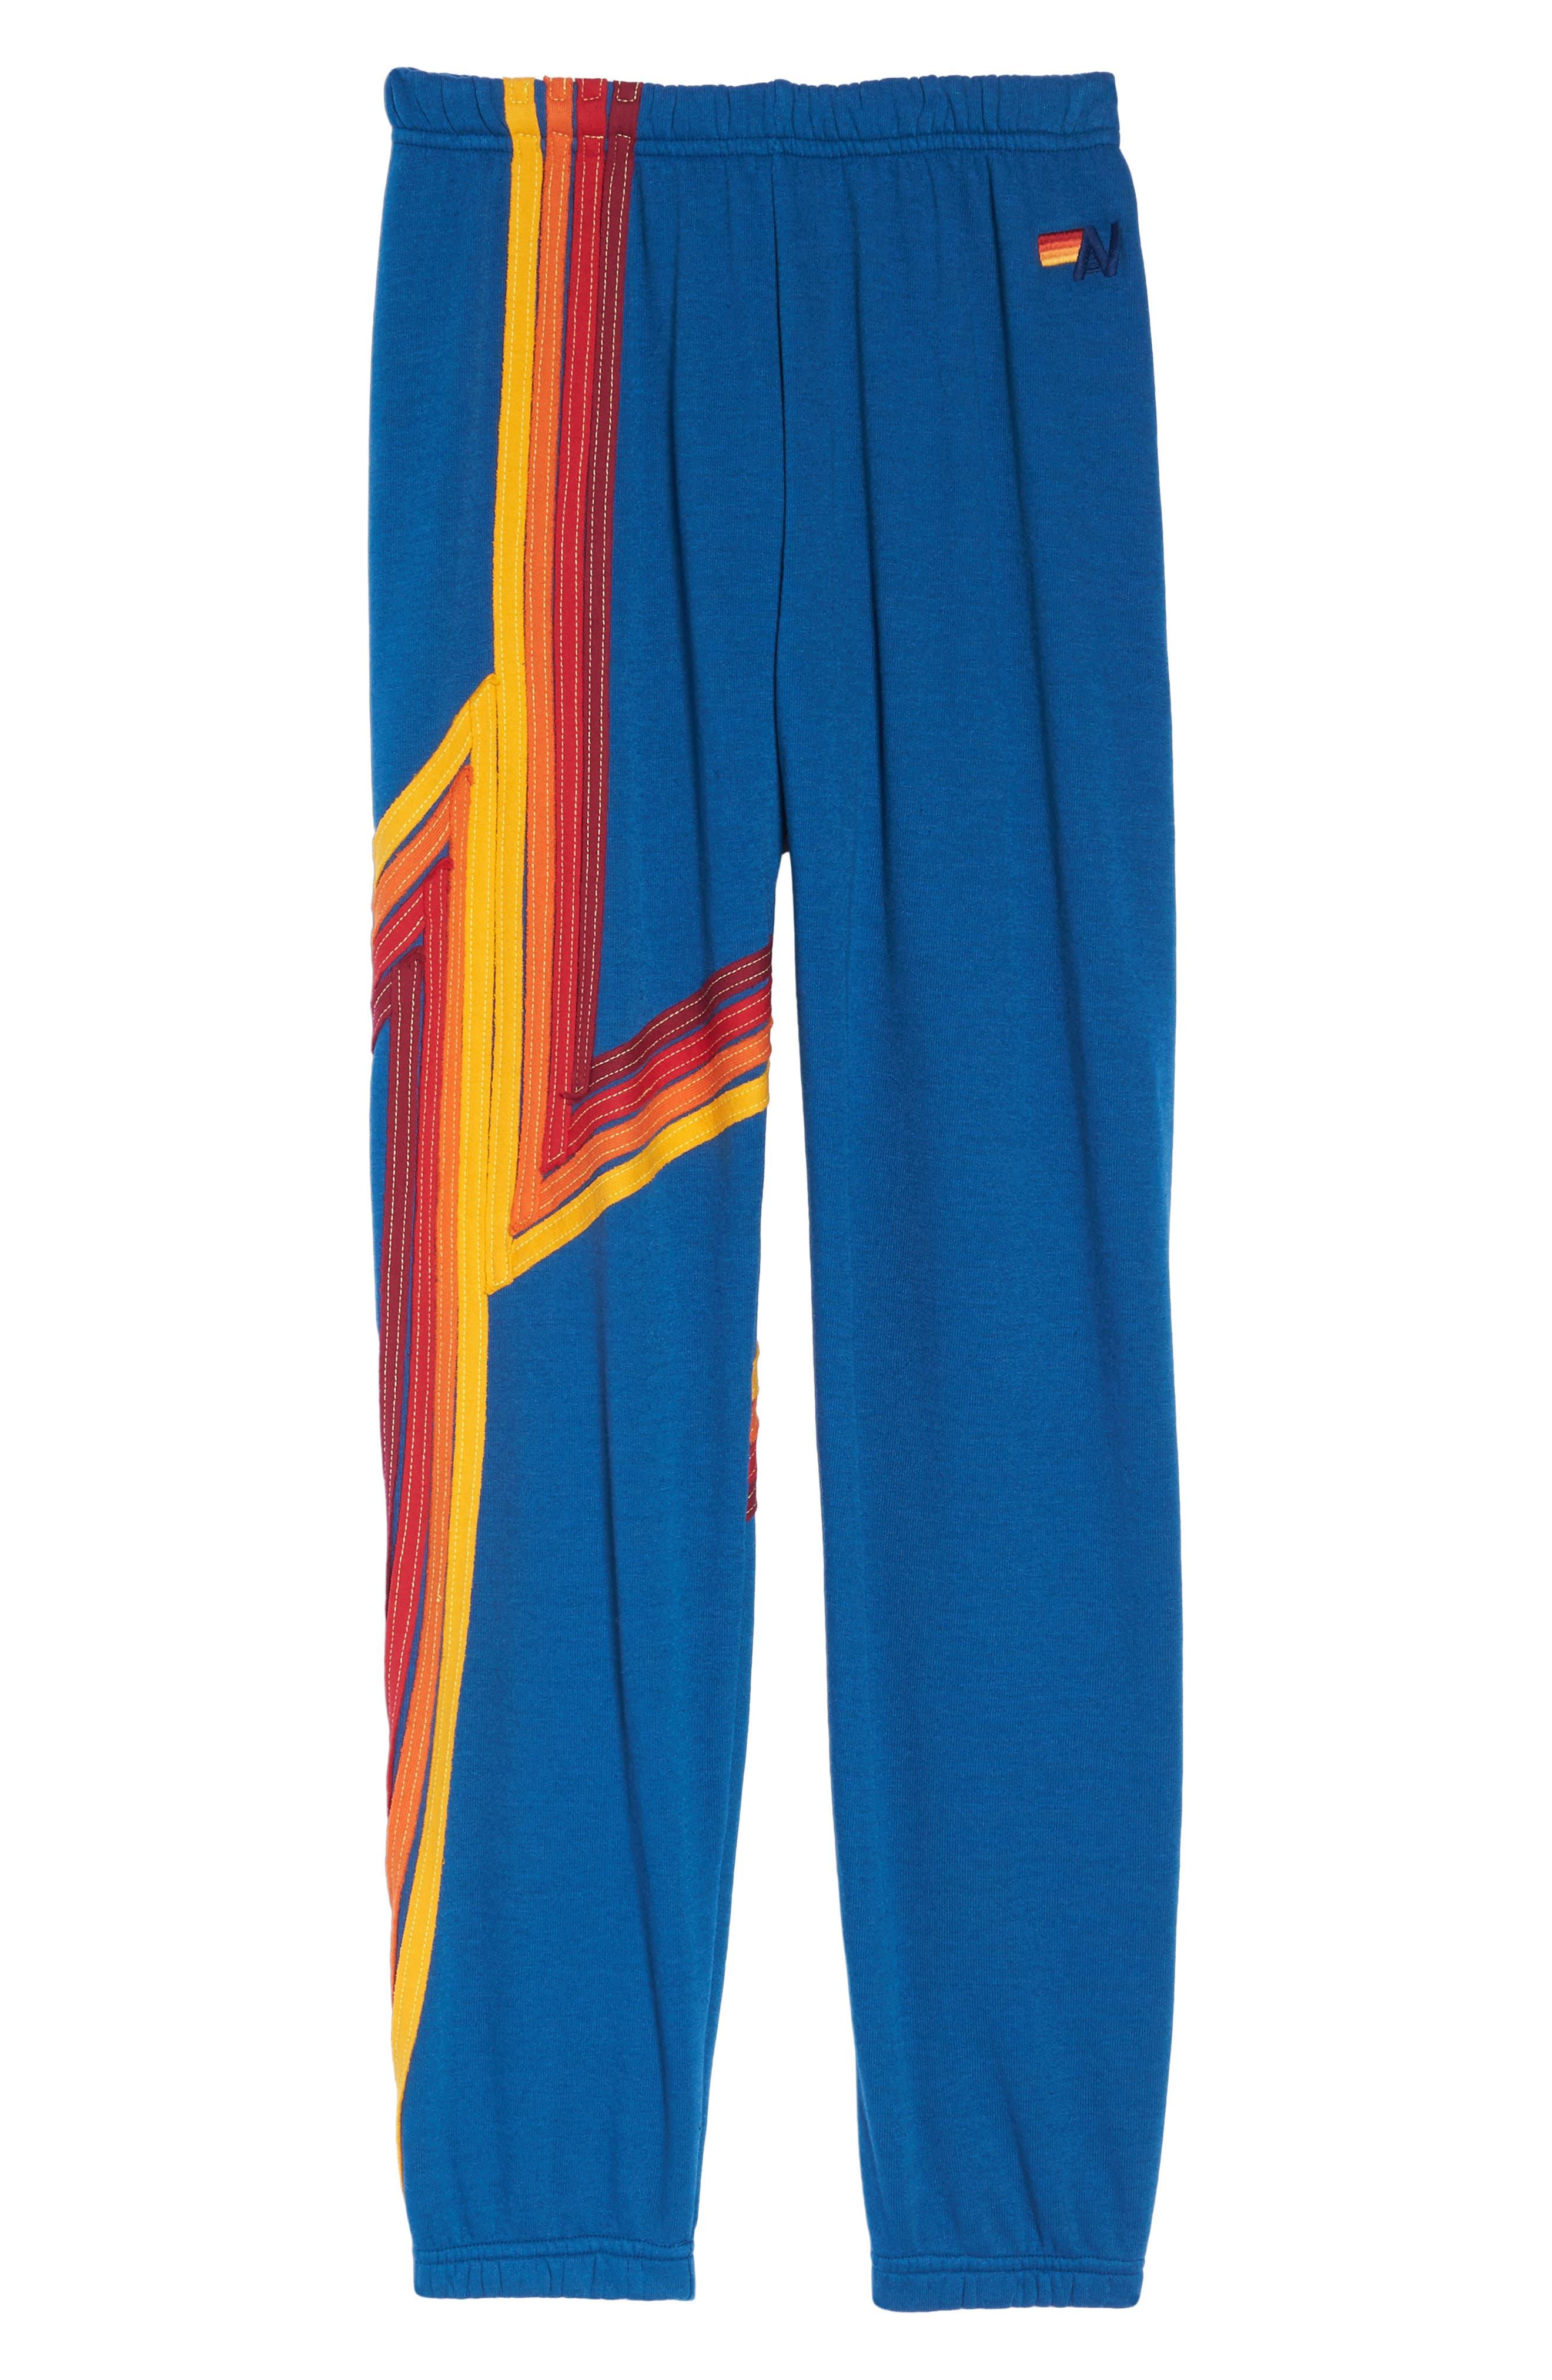 Blaze 4 Sweatpants,                             Alternate thumbnail 7, color,                             Caribbean/ Red Stripe